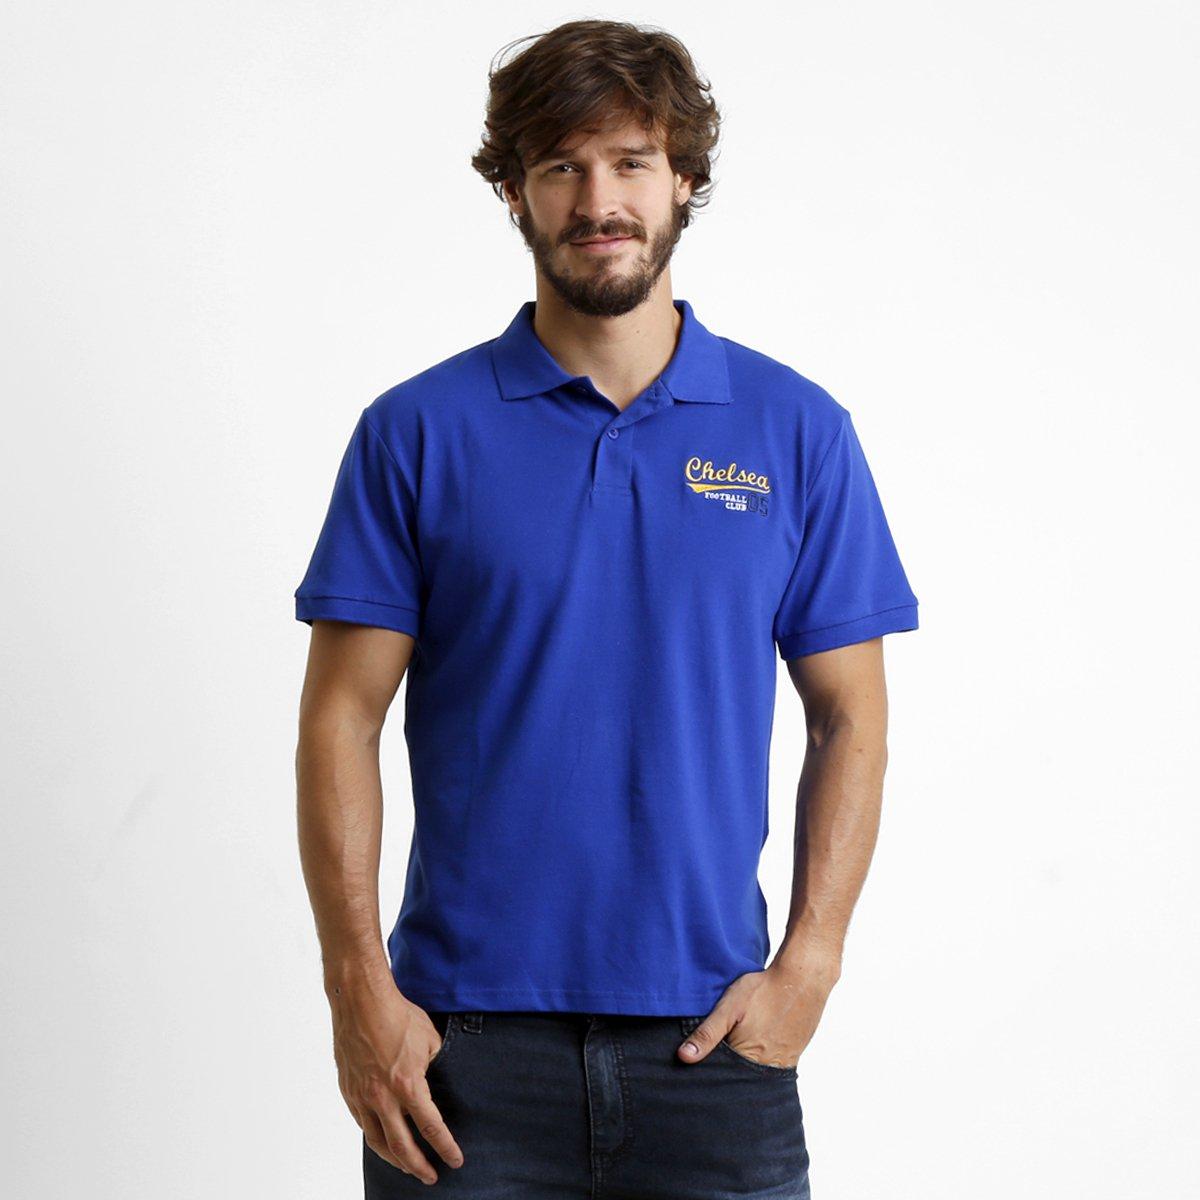 f600276af764f Camisa Polo Chelsea - Compre Agora